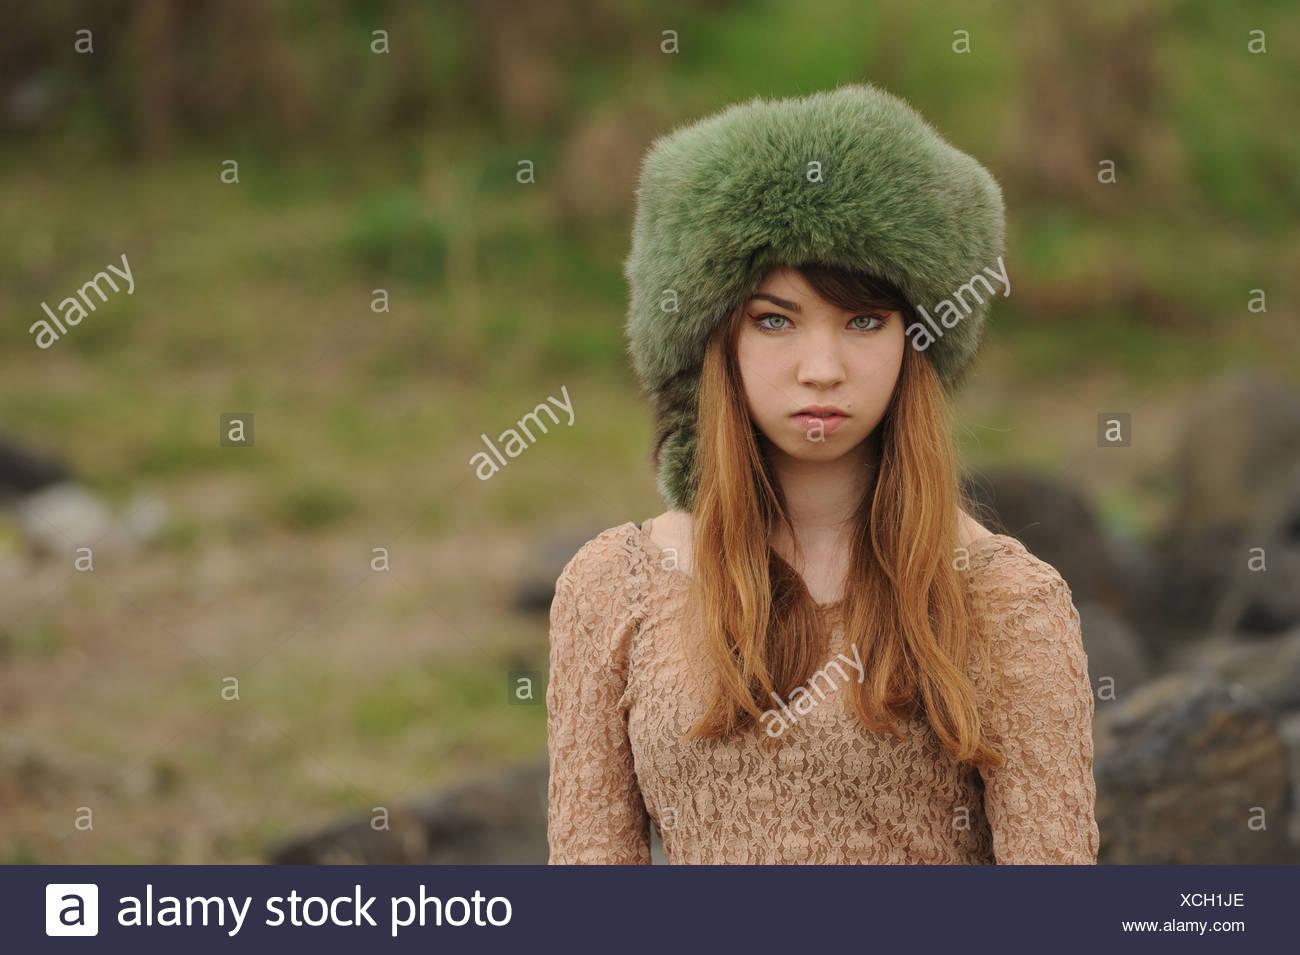 Teenage girl wearing fur hat outdoors - Stock Image